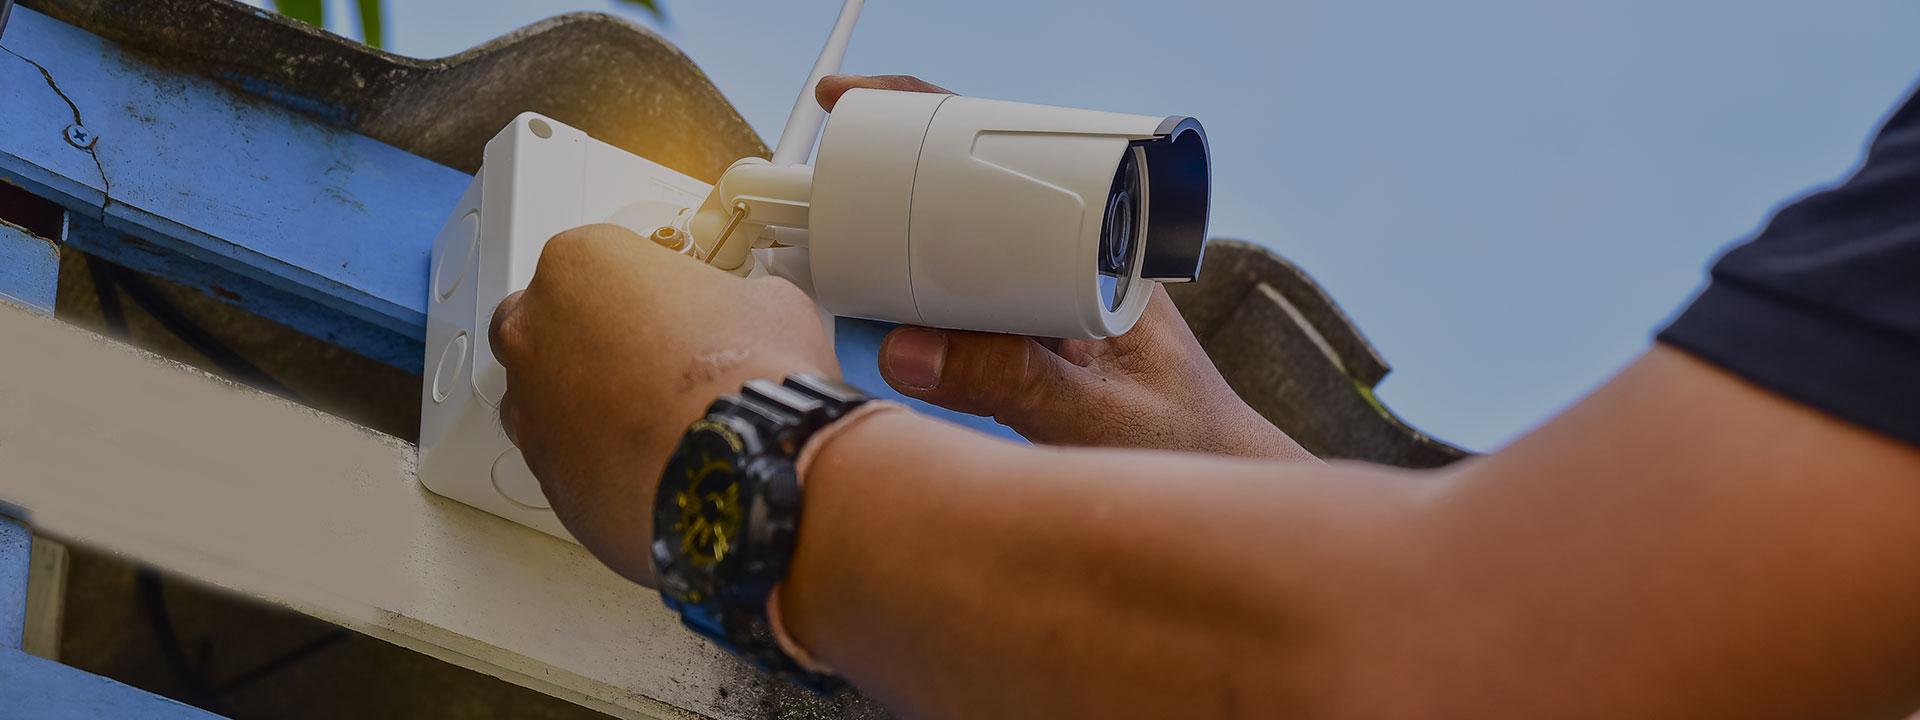 CCTV Installation kannur|Ipcamera kannur|CCTV repair in kannur